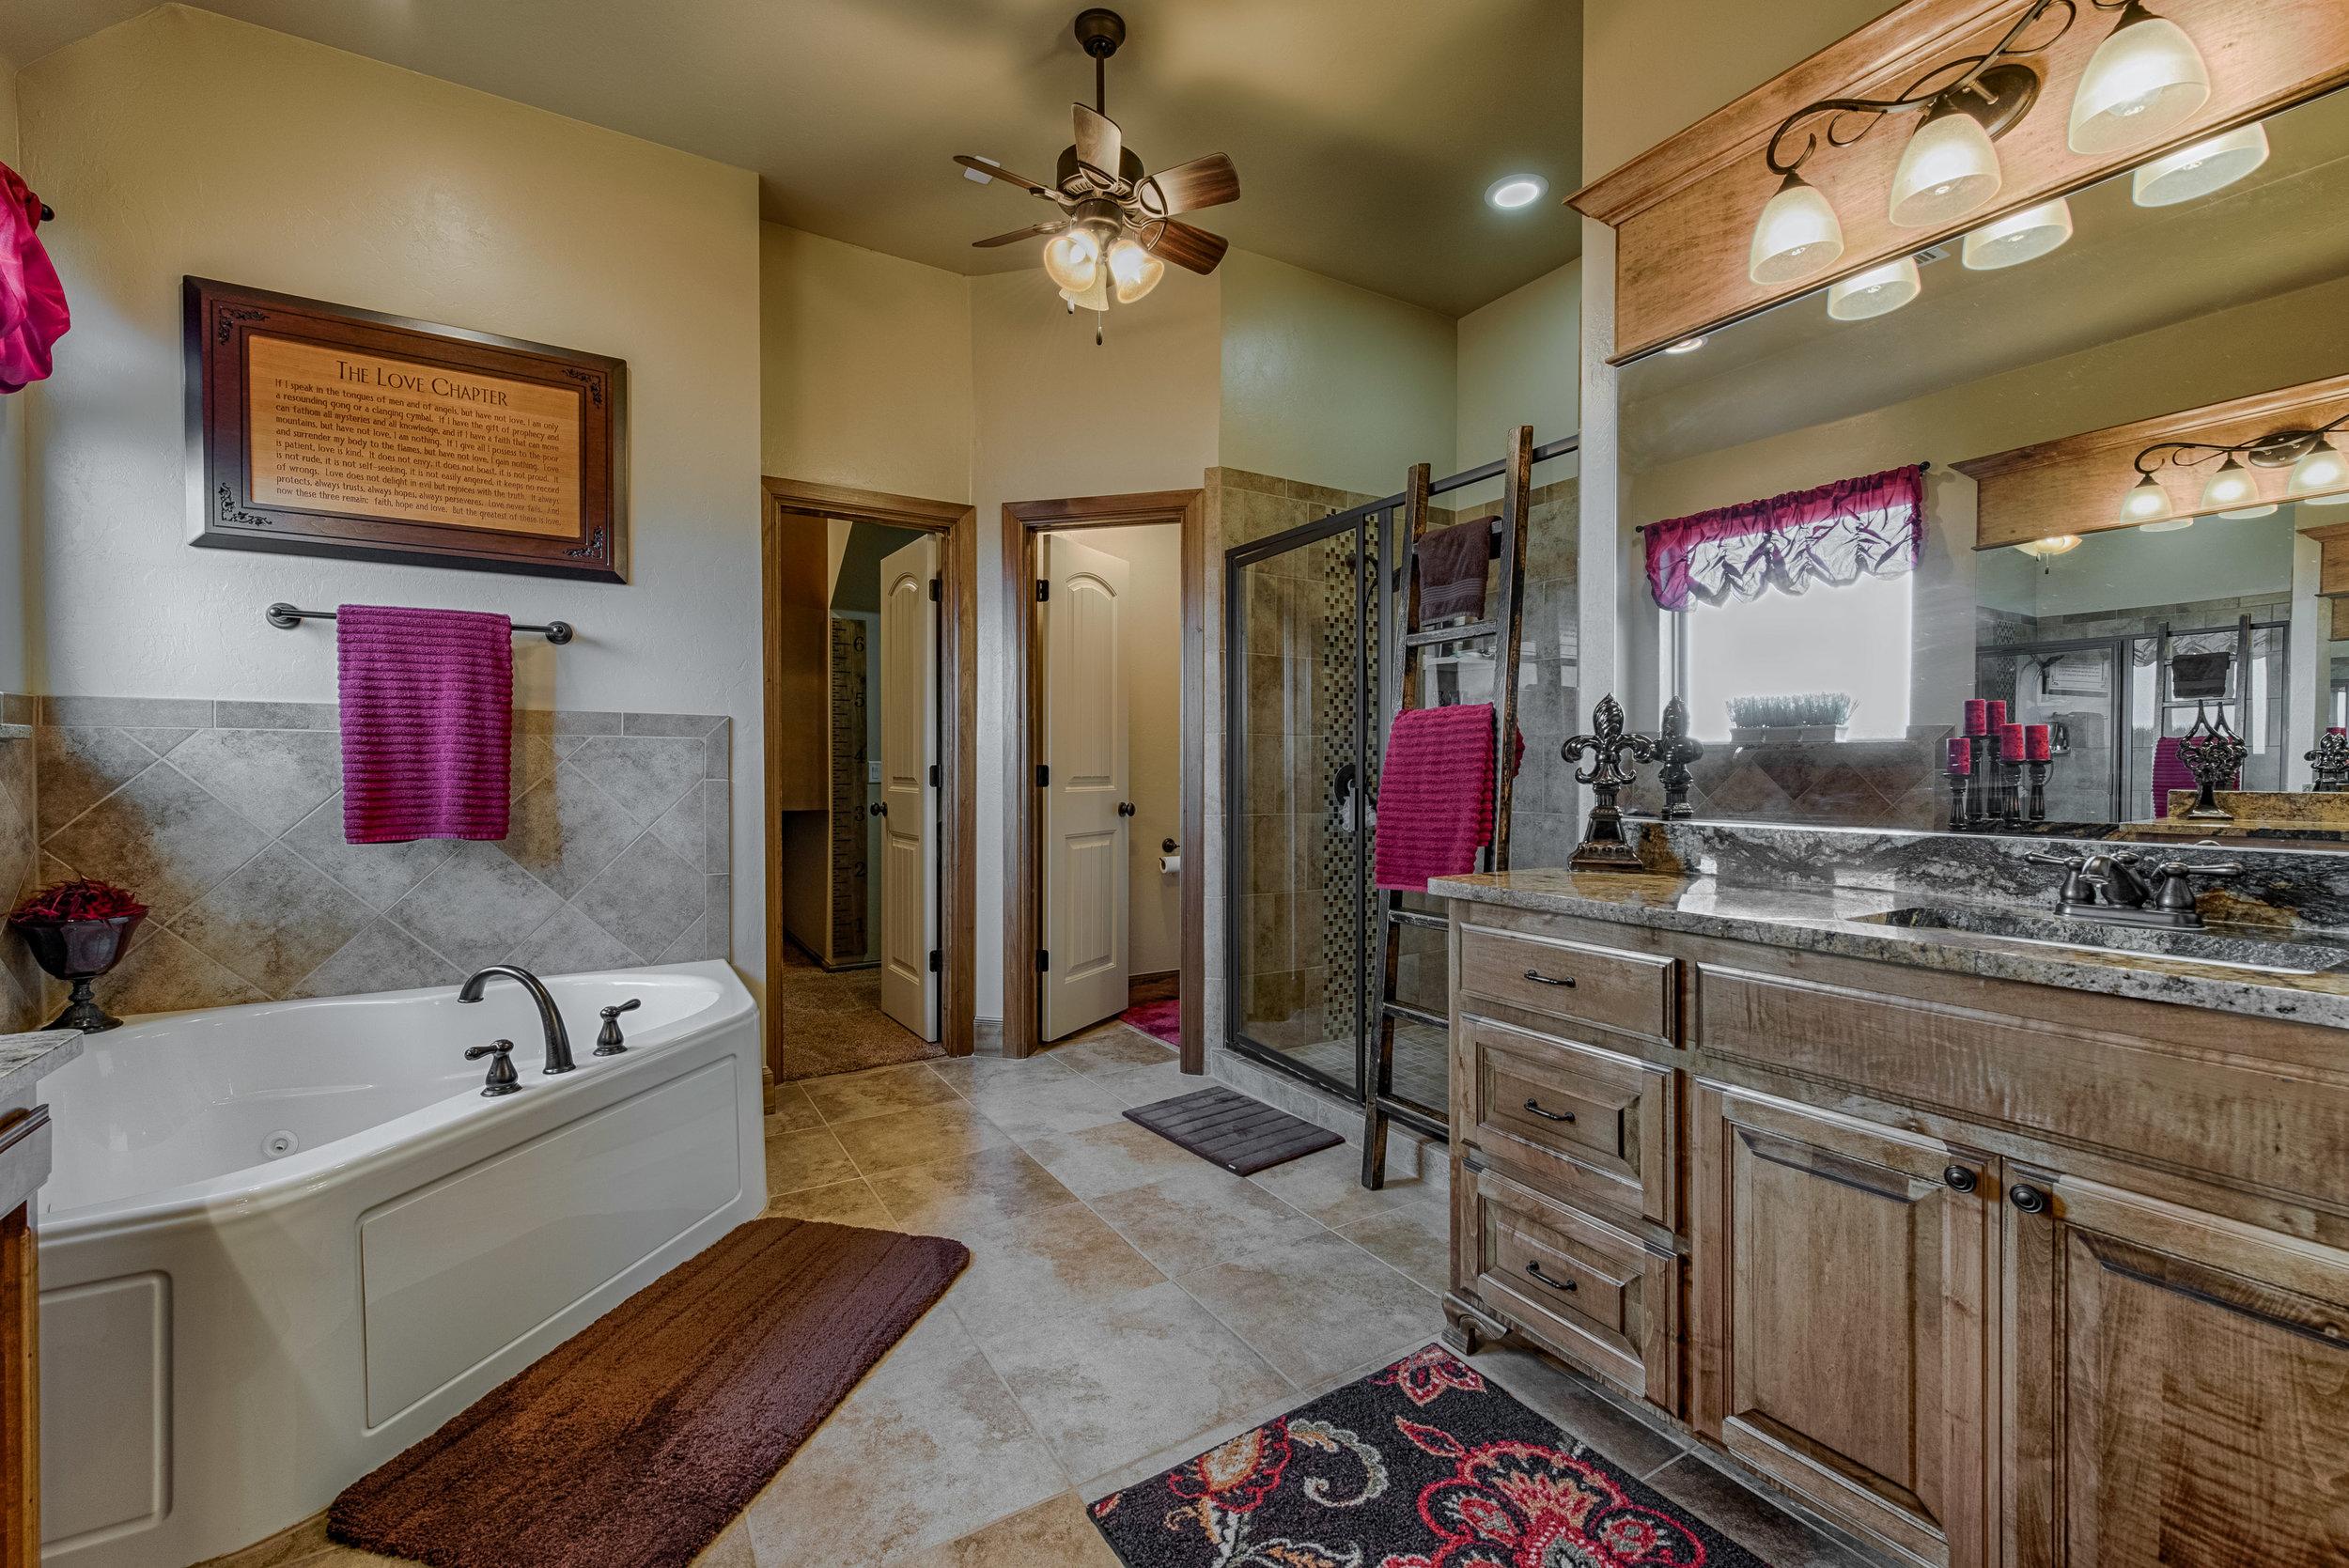 025-Master Bathroom.jpg